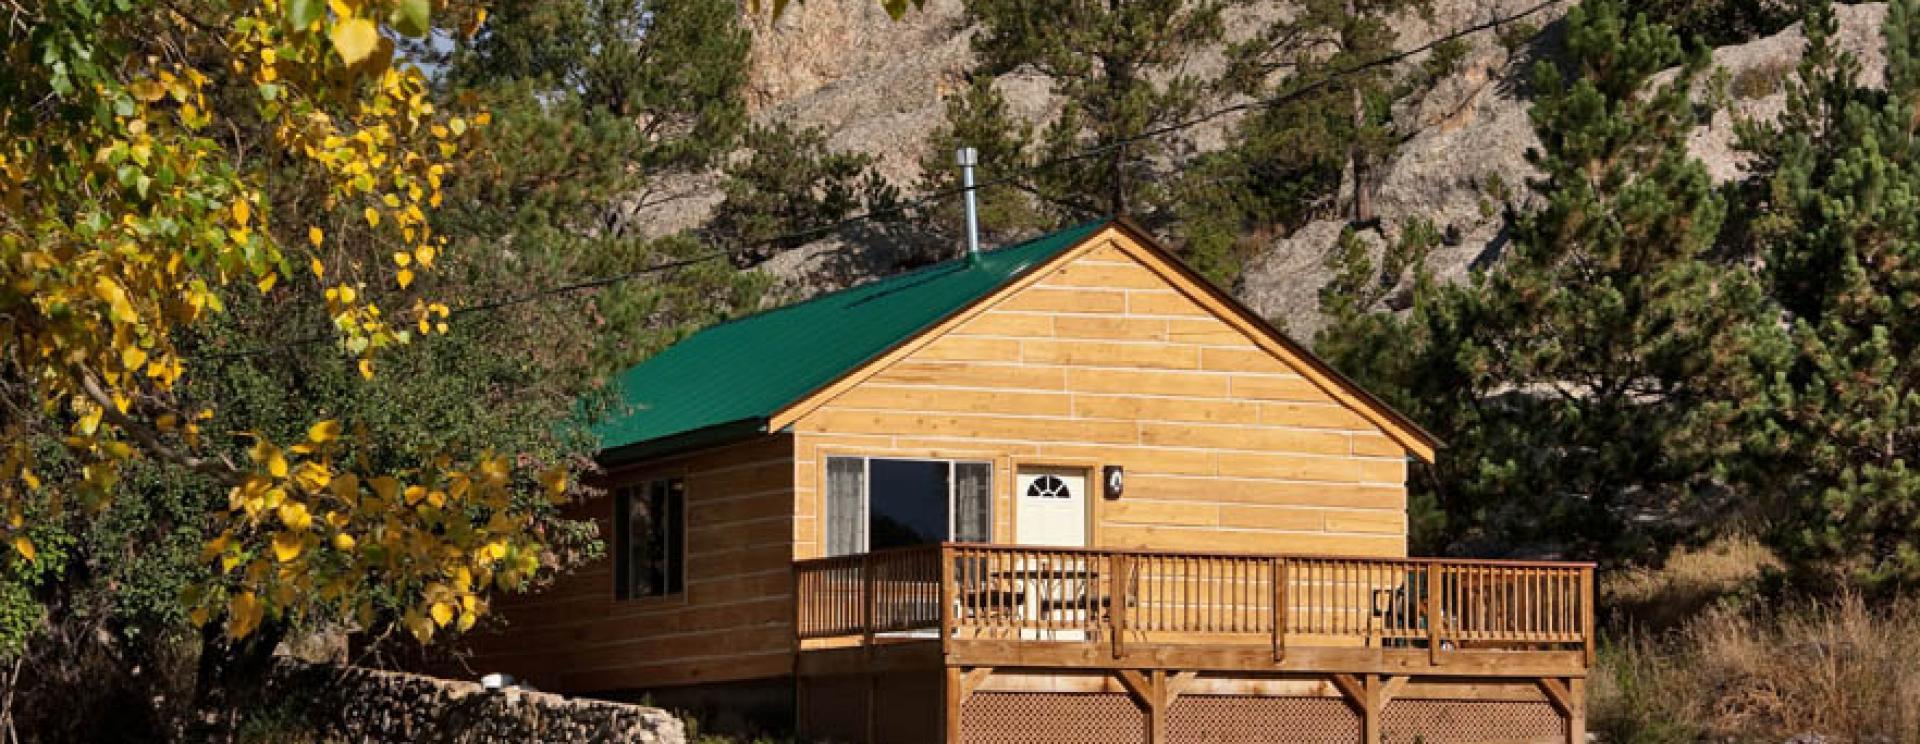 Rock Crest Lodge & Cabins